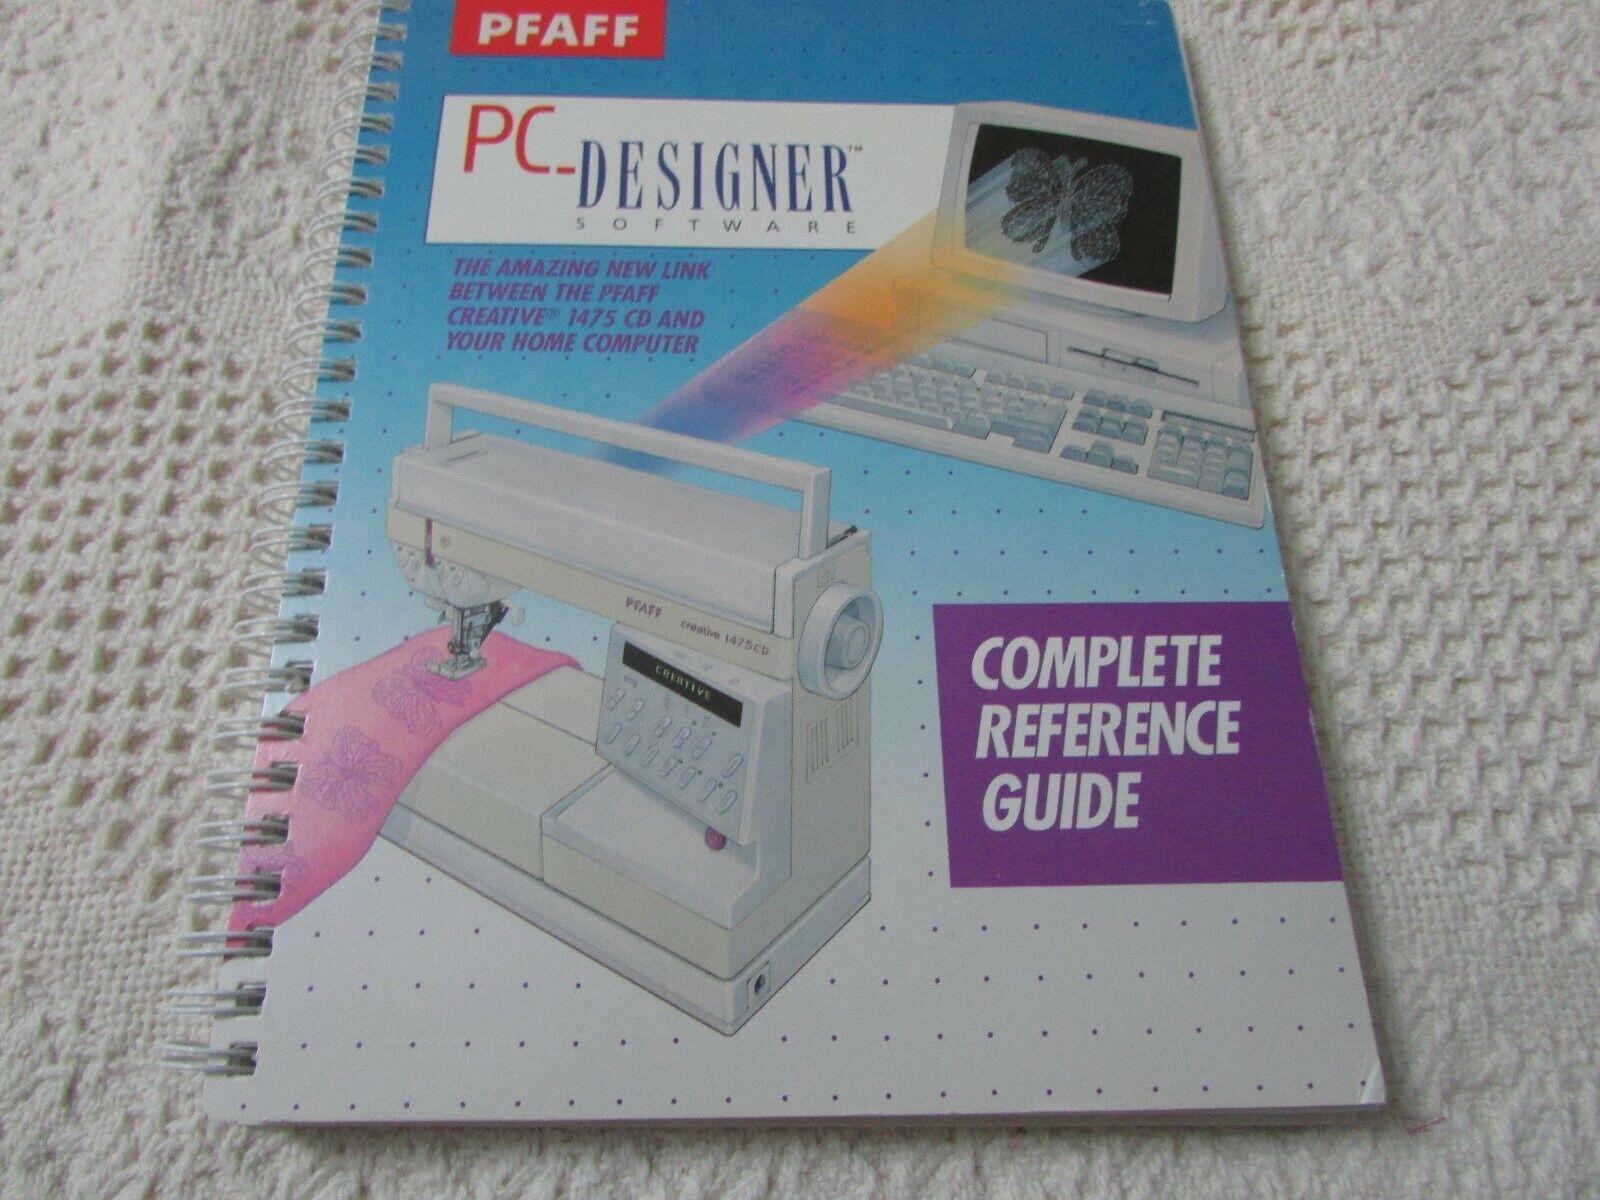 Pfaff 7550 1475 Pc Designer Software Original Manual Excellent Pre Own Condition Ebay